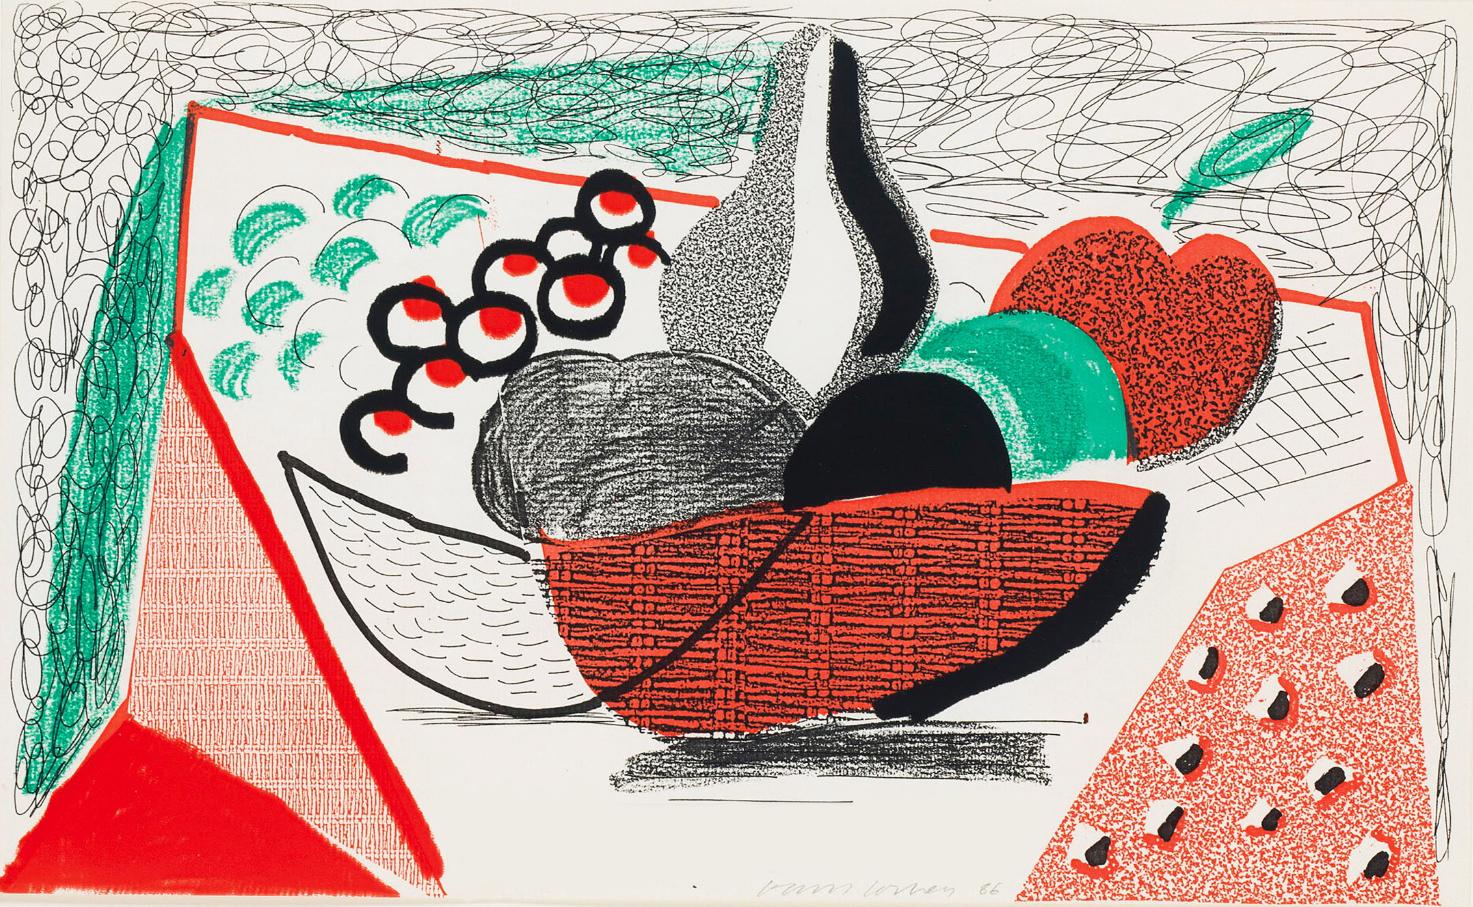 Apples Pears & Grapes, May 1986 by David Hockney